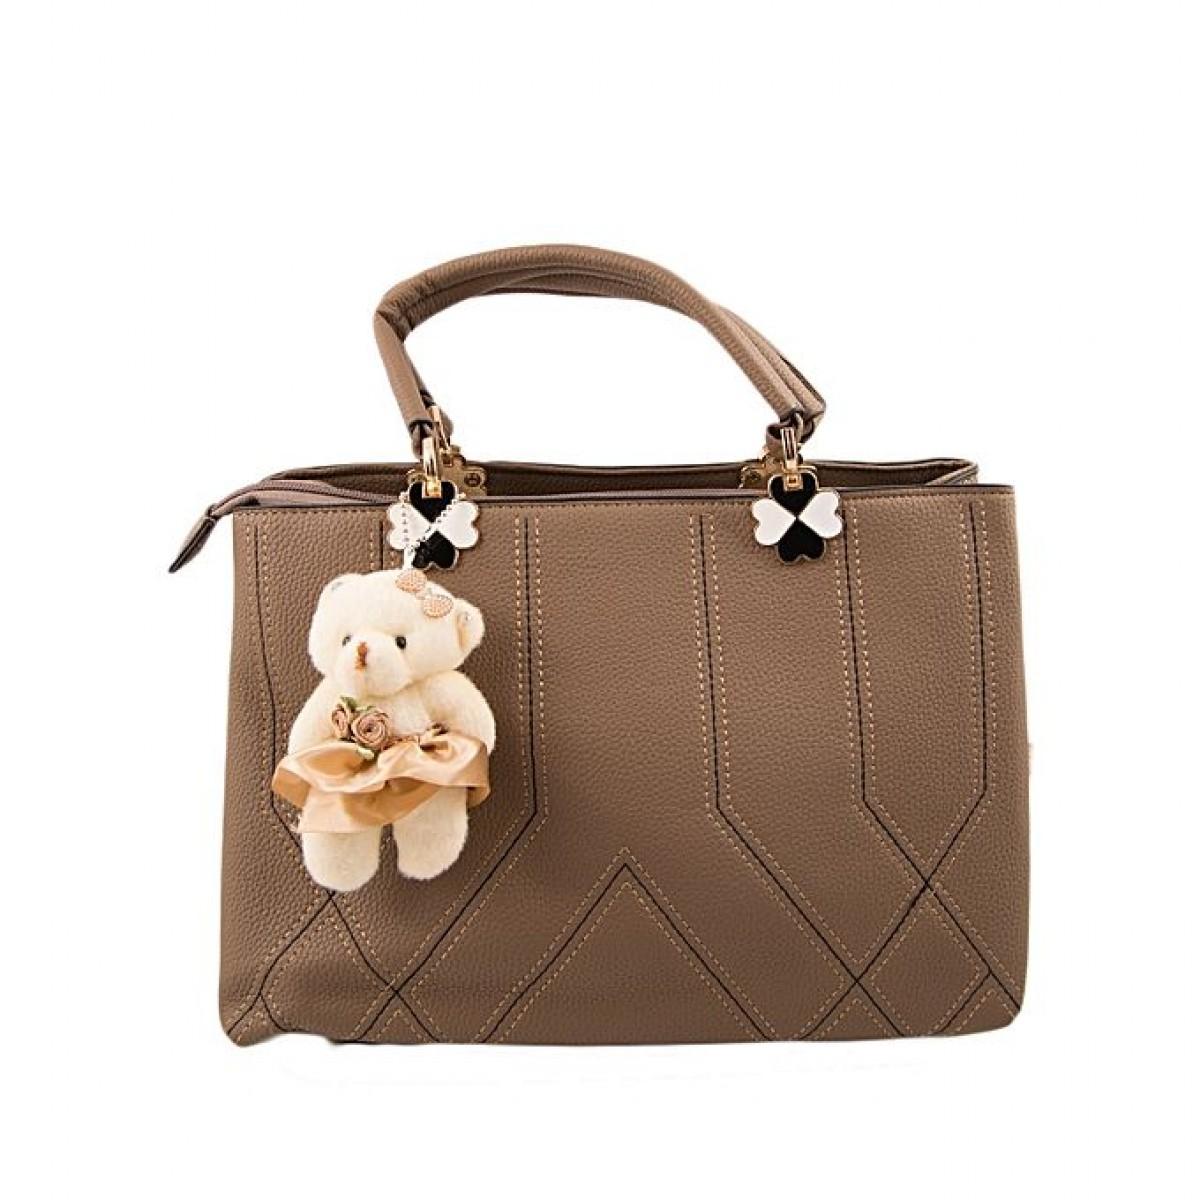 Bags   Deals Leather Handbag For Women Price in Pakistan  41e447ba9c293